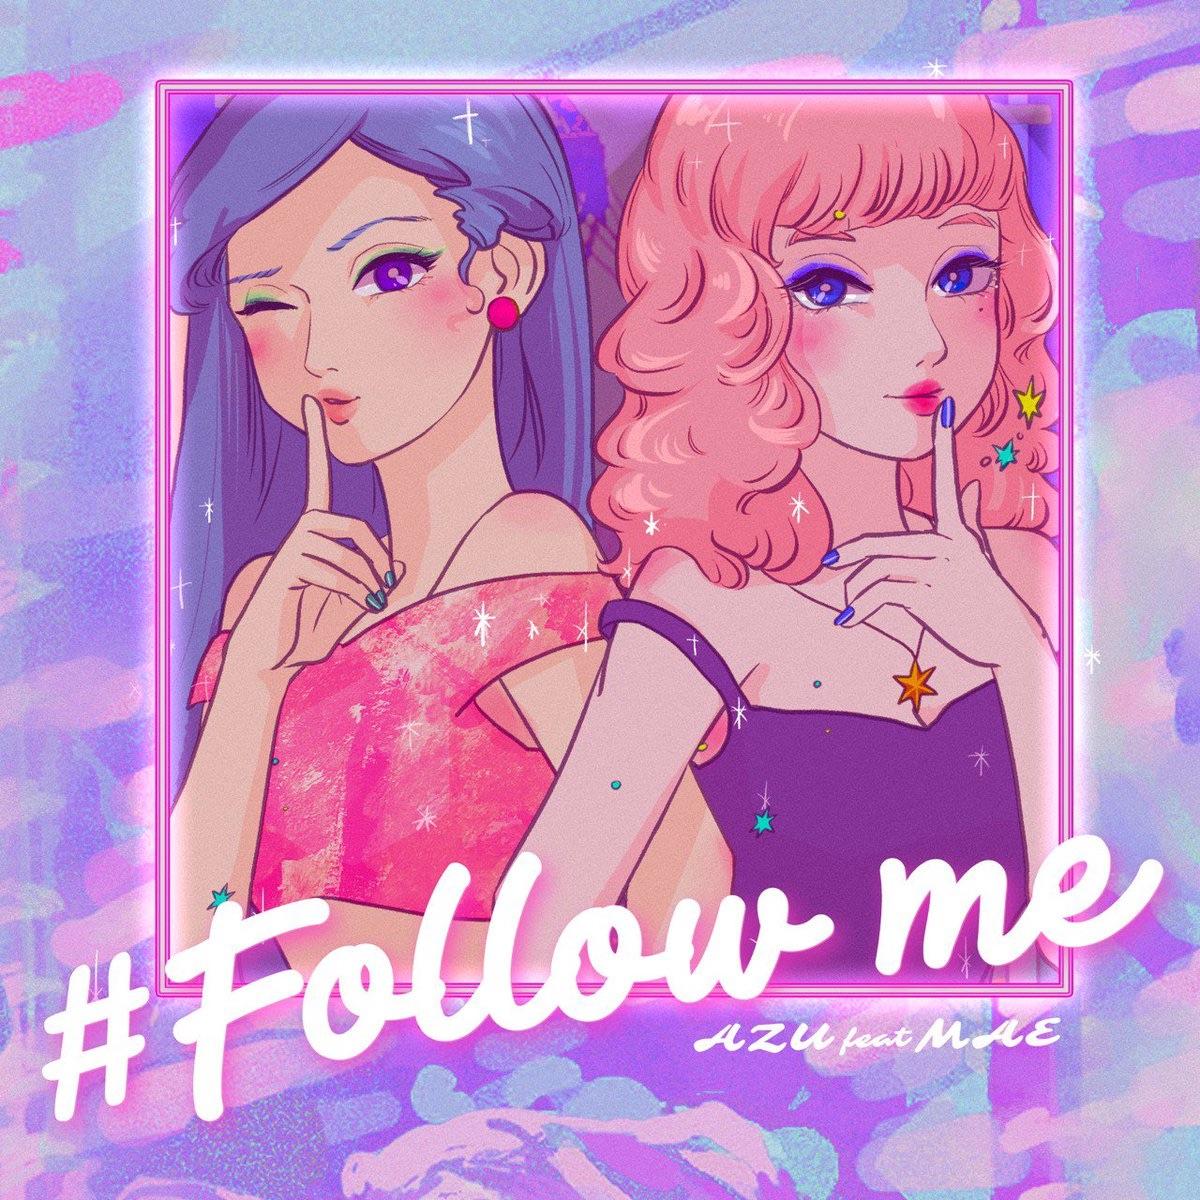 AZU feat. MAE - #Follow me